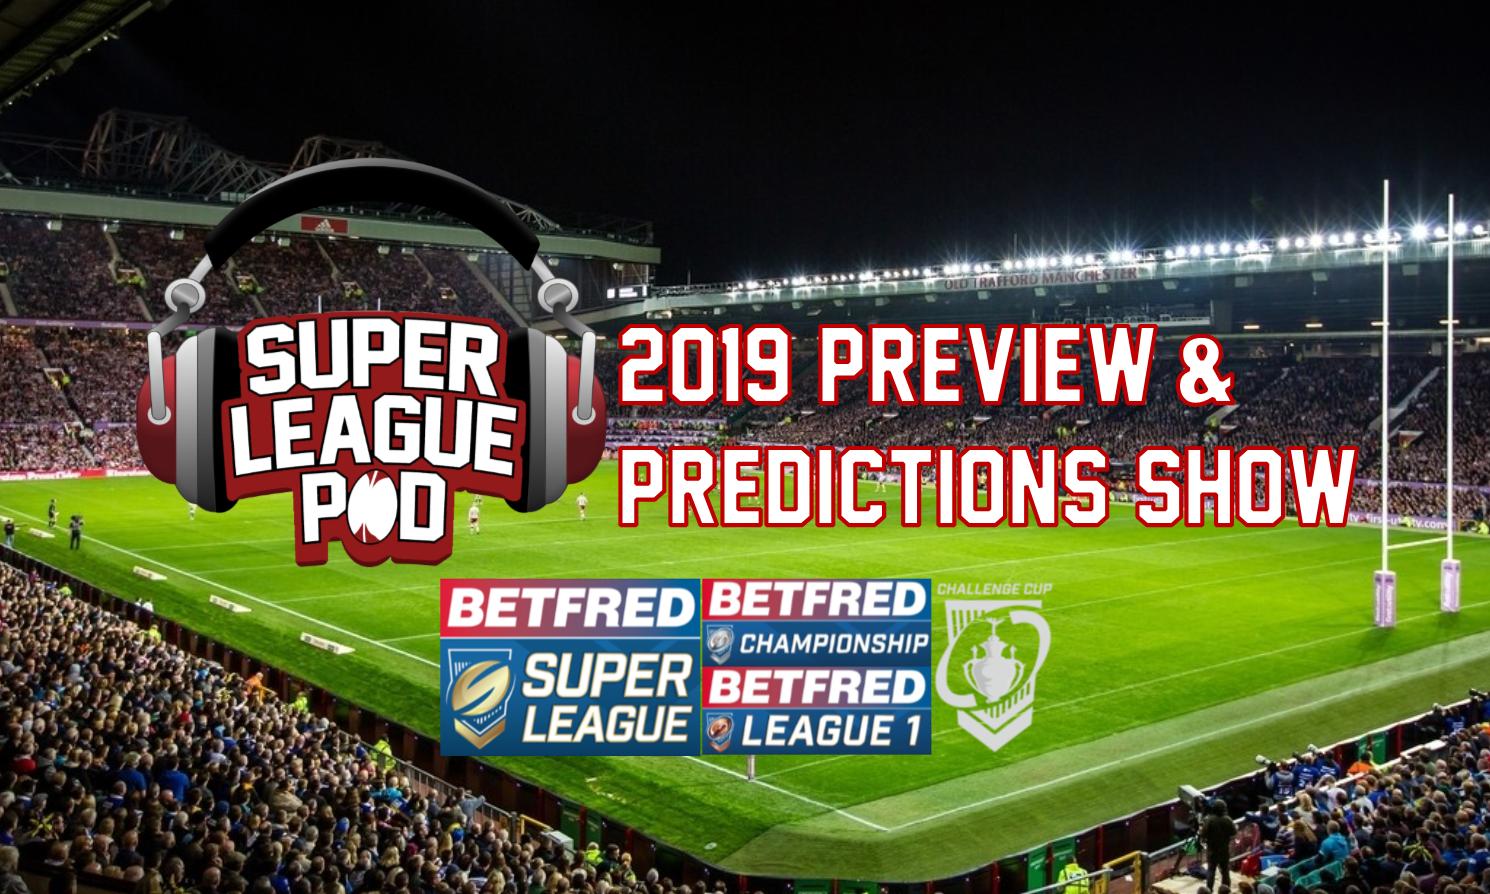 Super League Pod Blog: January 2019